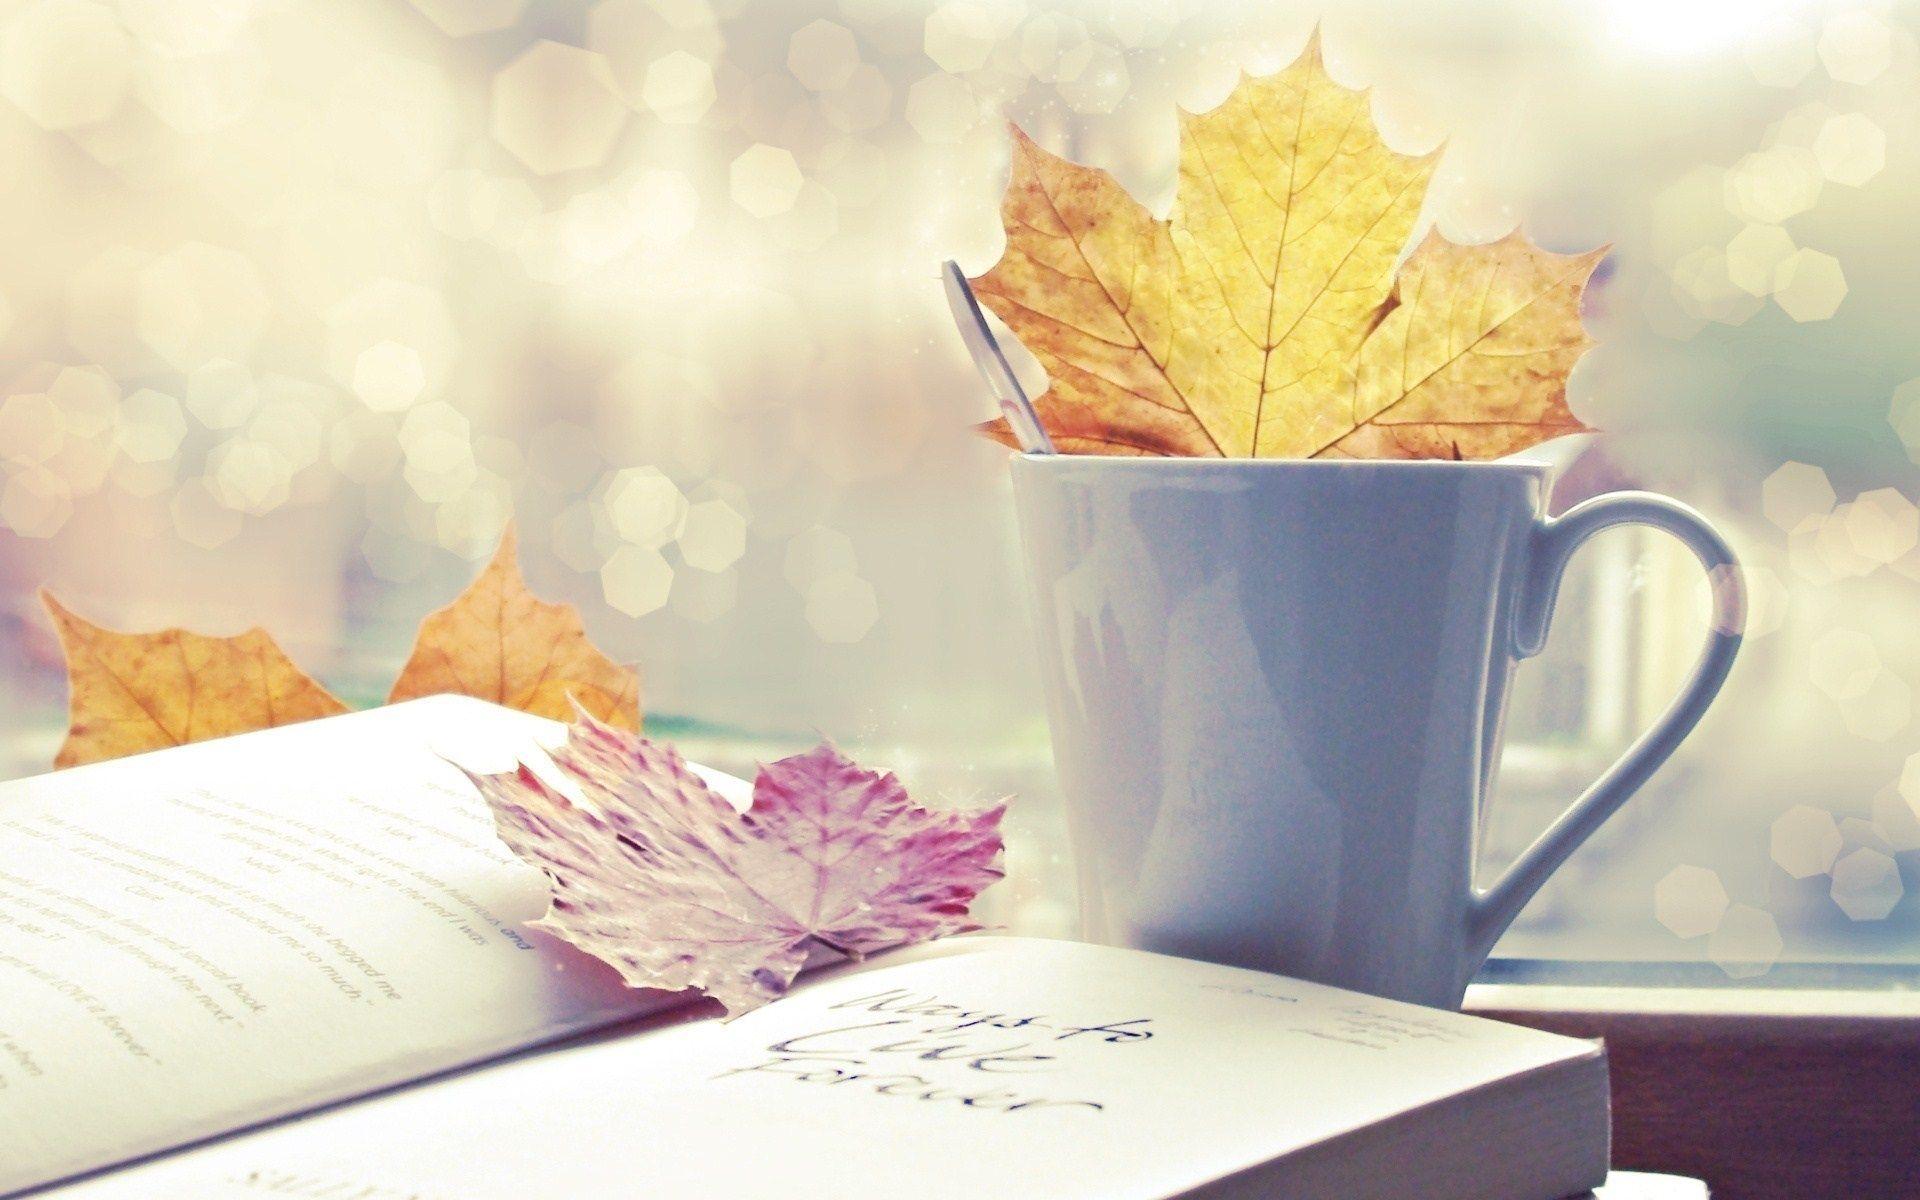 Red Fall Leaves Iphone Wallpaper Book Desktop Wallpaper Images Hd Wallpapers Ololoshenka